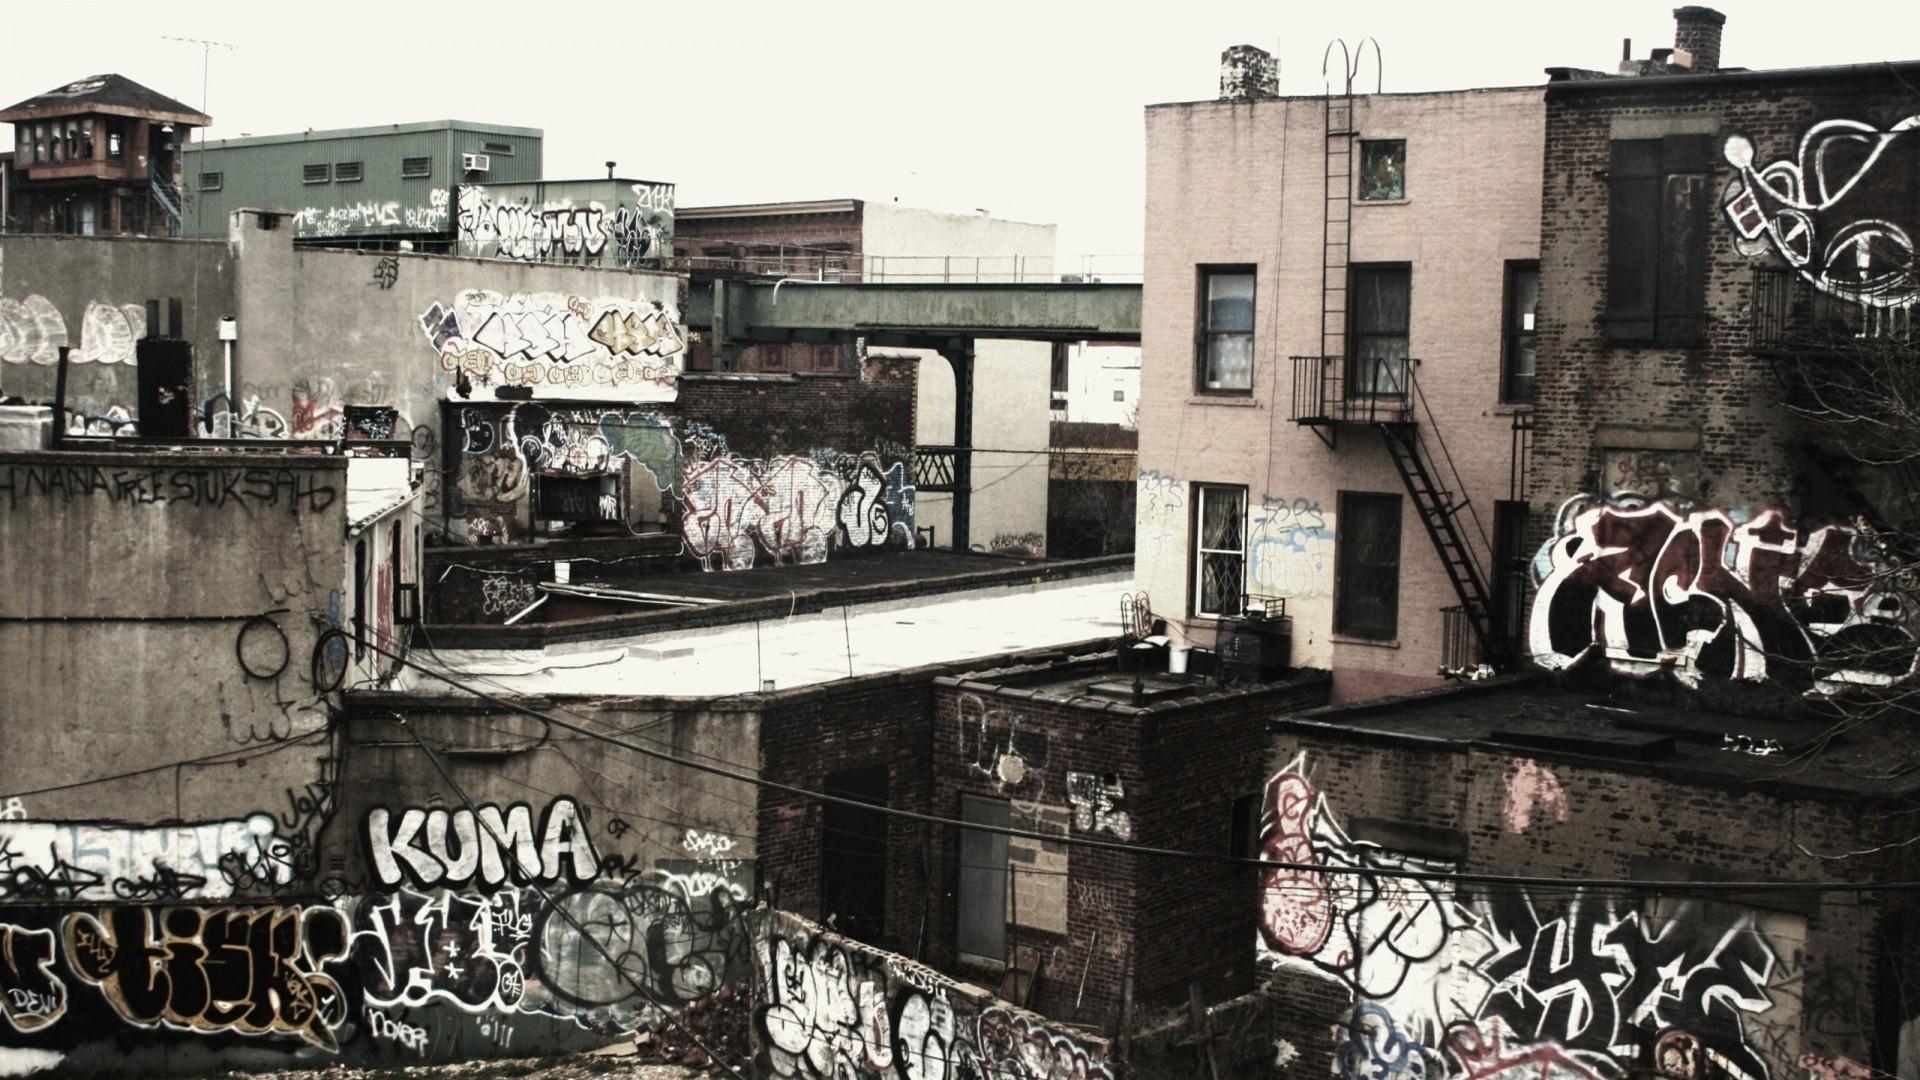 Černé ghetto kořist obrázky